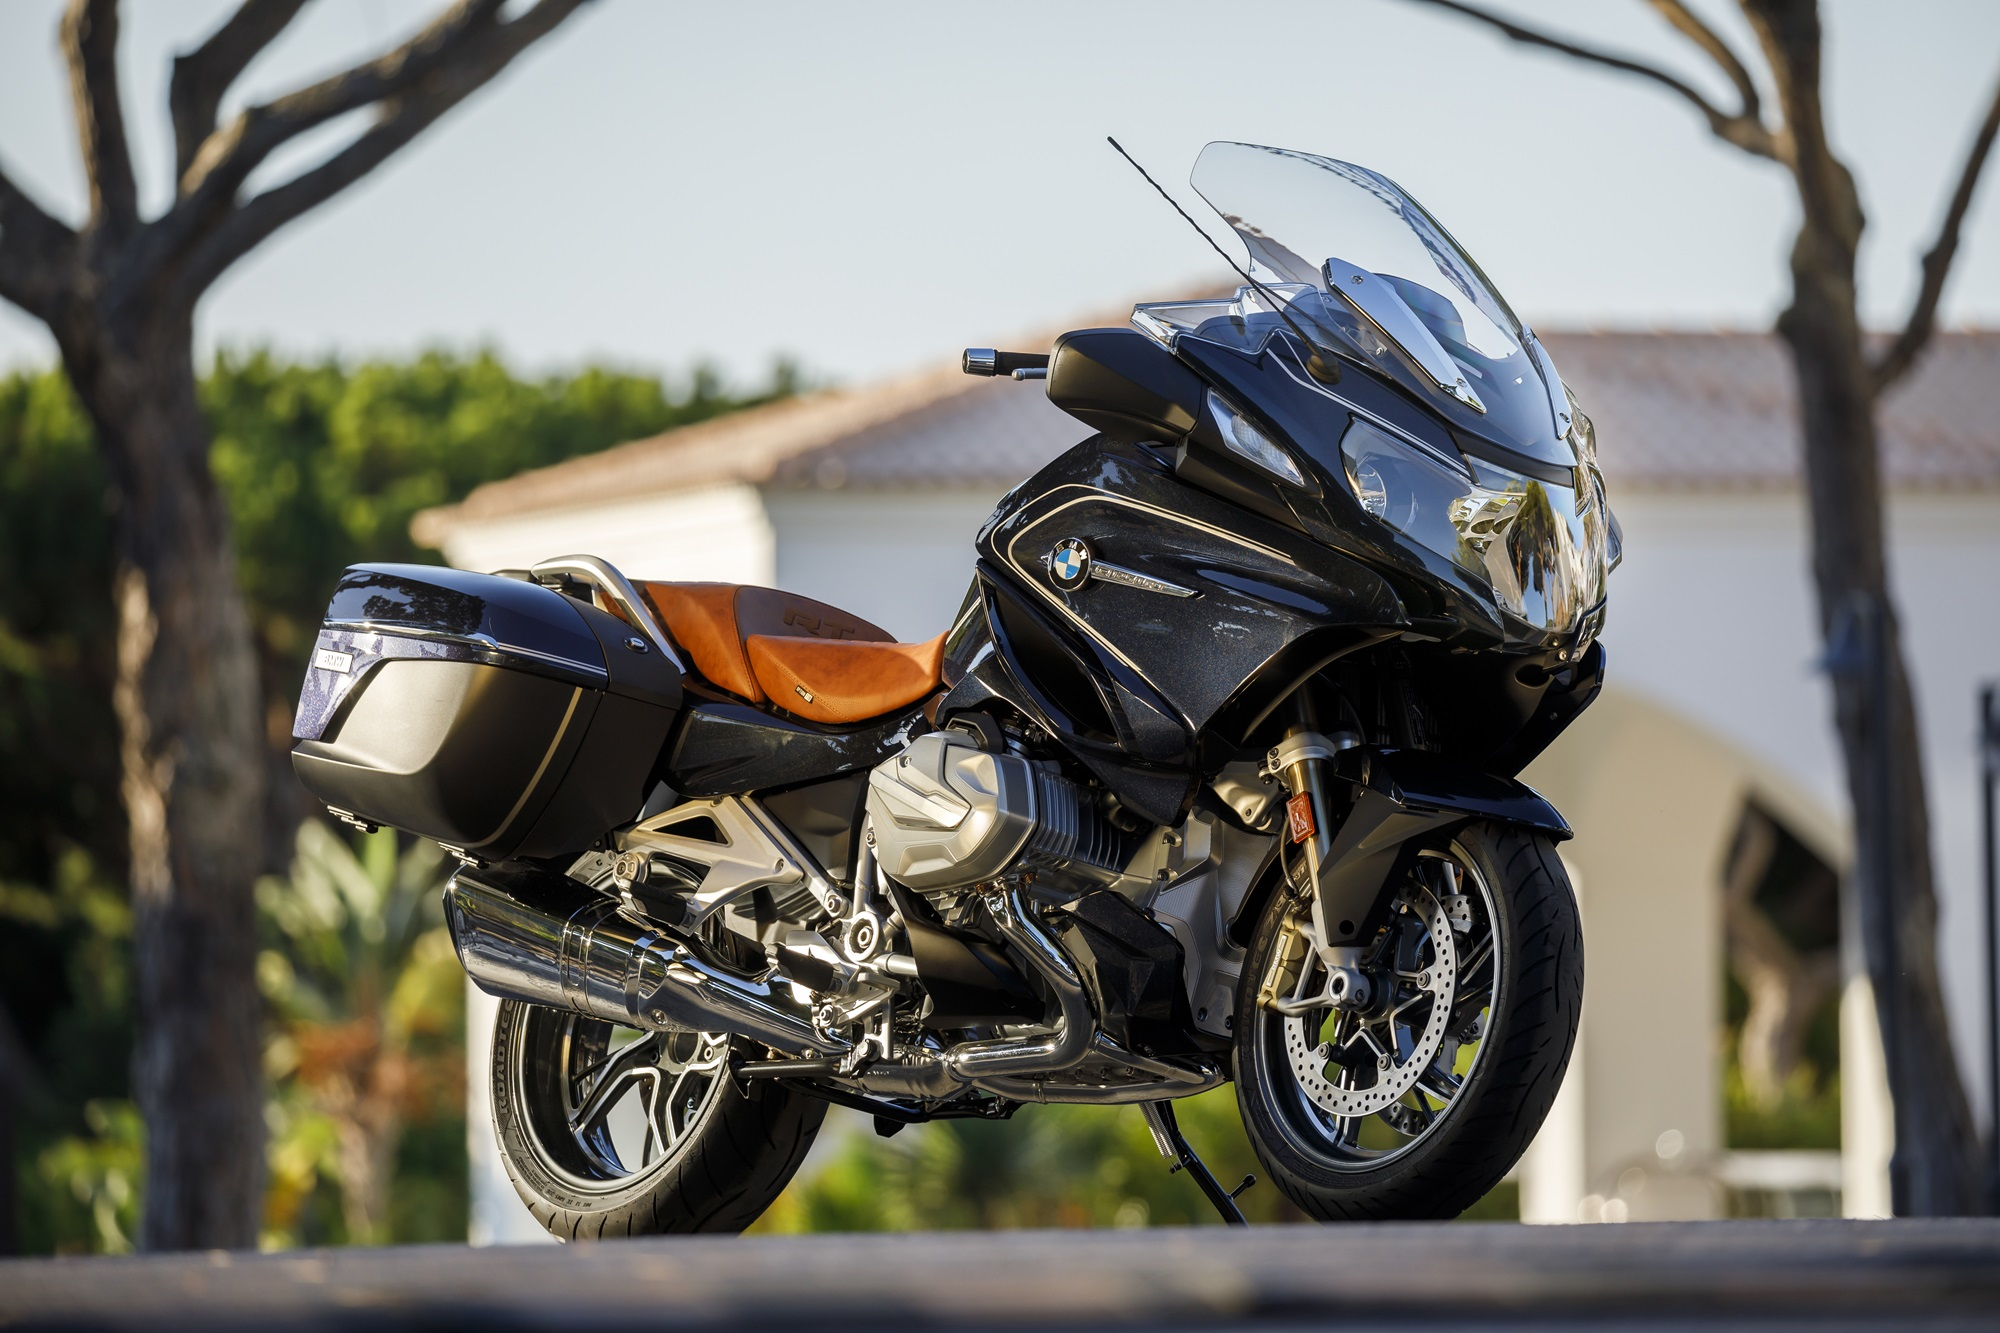 2019 bmw r 1250 rt  iamabiker  everything motorcycle